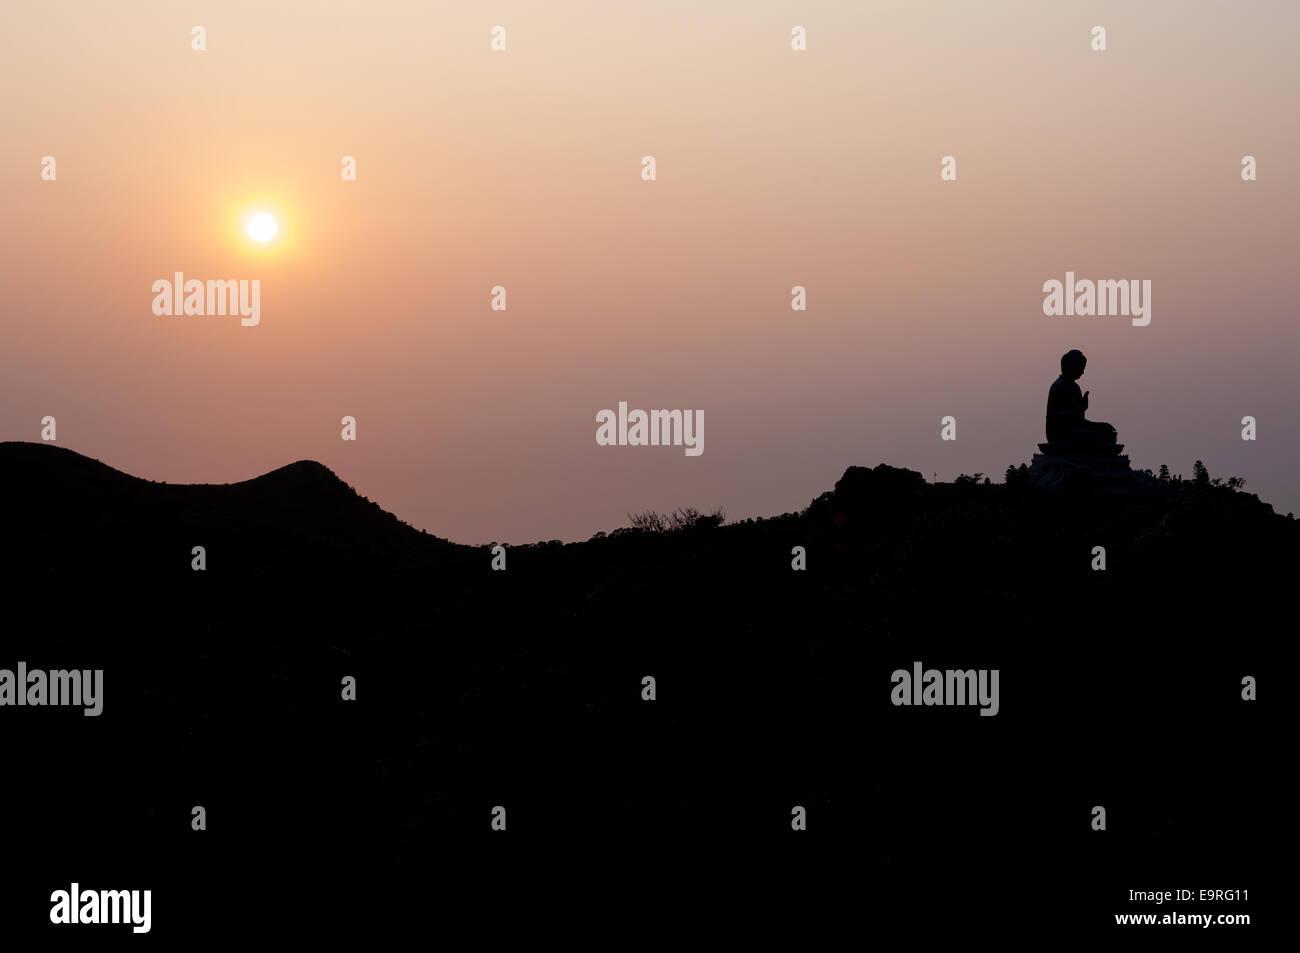 Hong Kong Big Buddha at sunset, Lantau Island - Stock Image